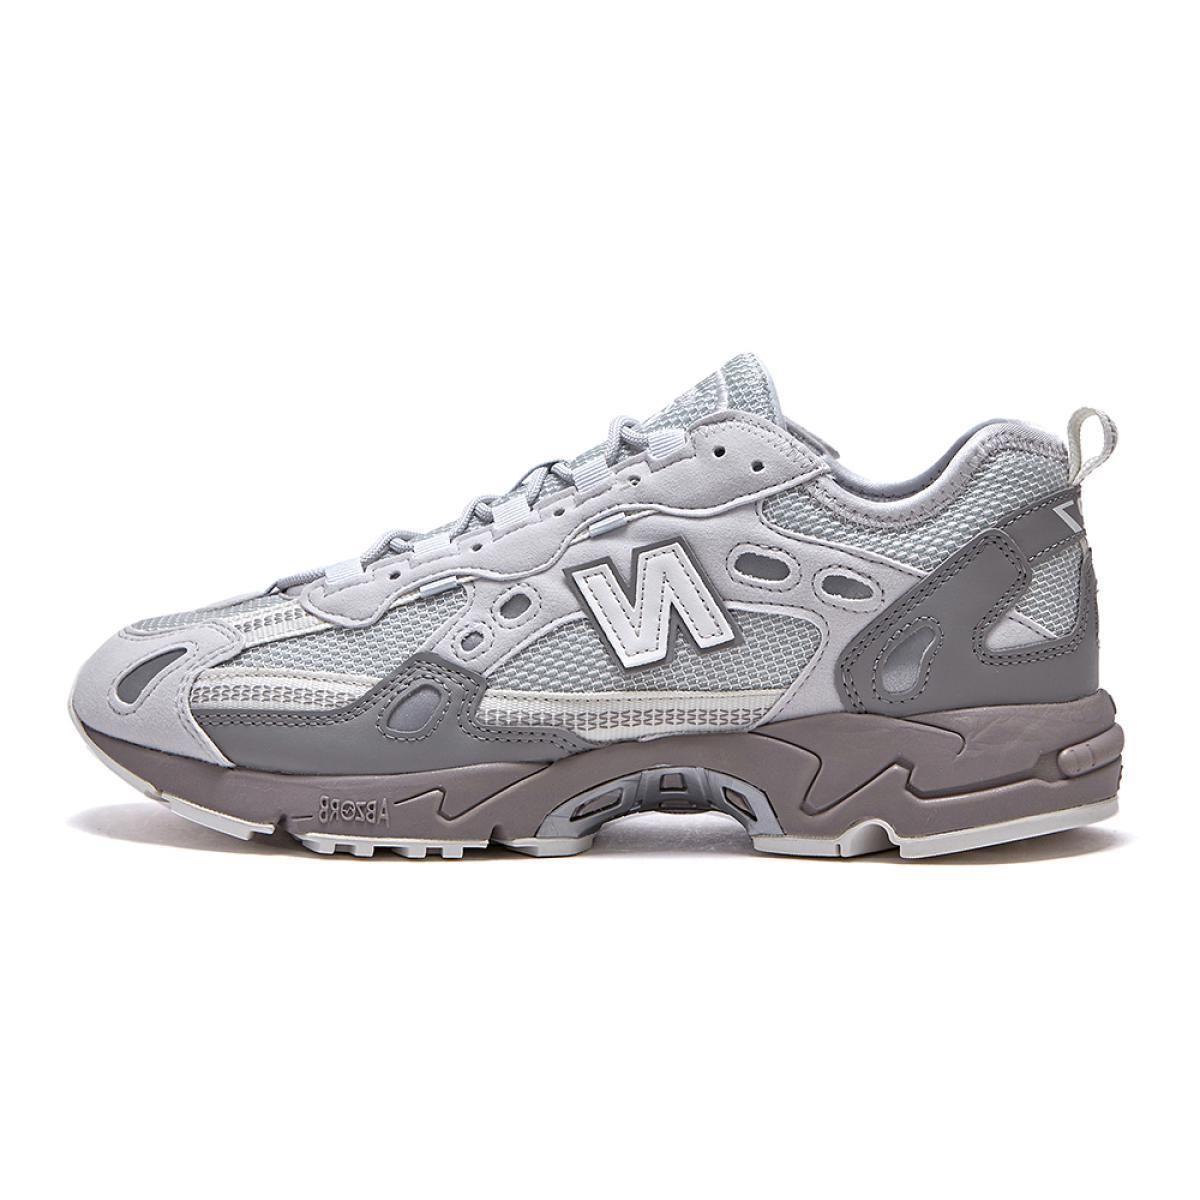 recinto ventaja Desafío  New Balance] 827 - Grey/White(ML827AAM #new #NewBalance [Instagram]  snkrhdkr [Official Store] snkrhdkr.com [eBay Store] stores.ebay.com/snkrhduk  - 2020